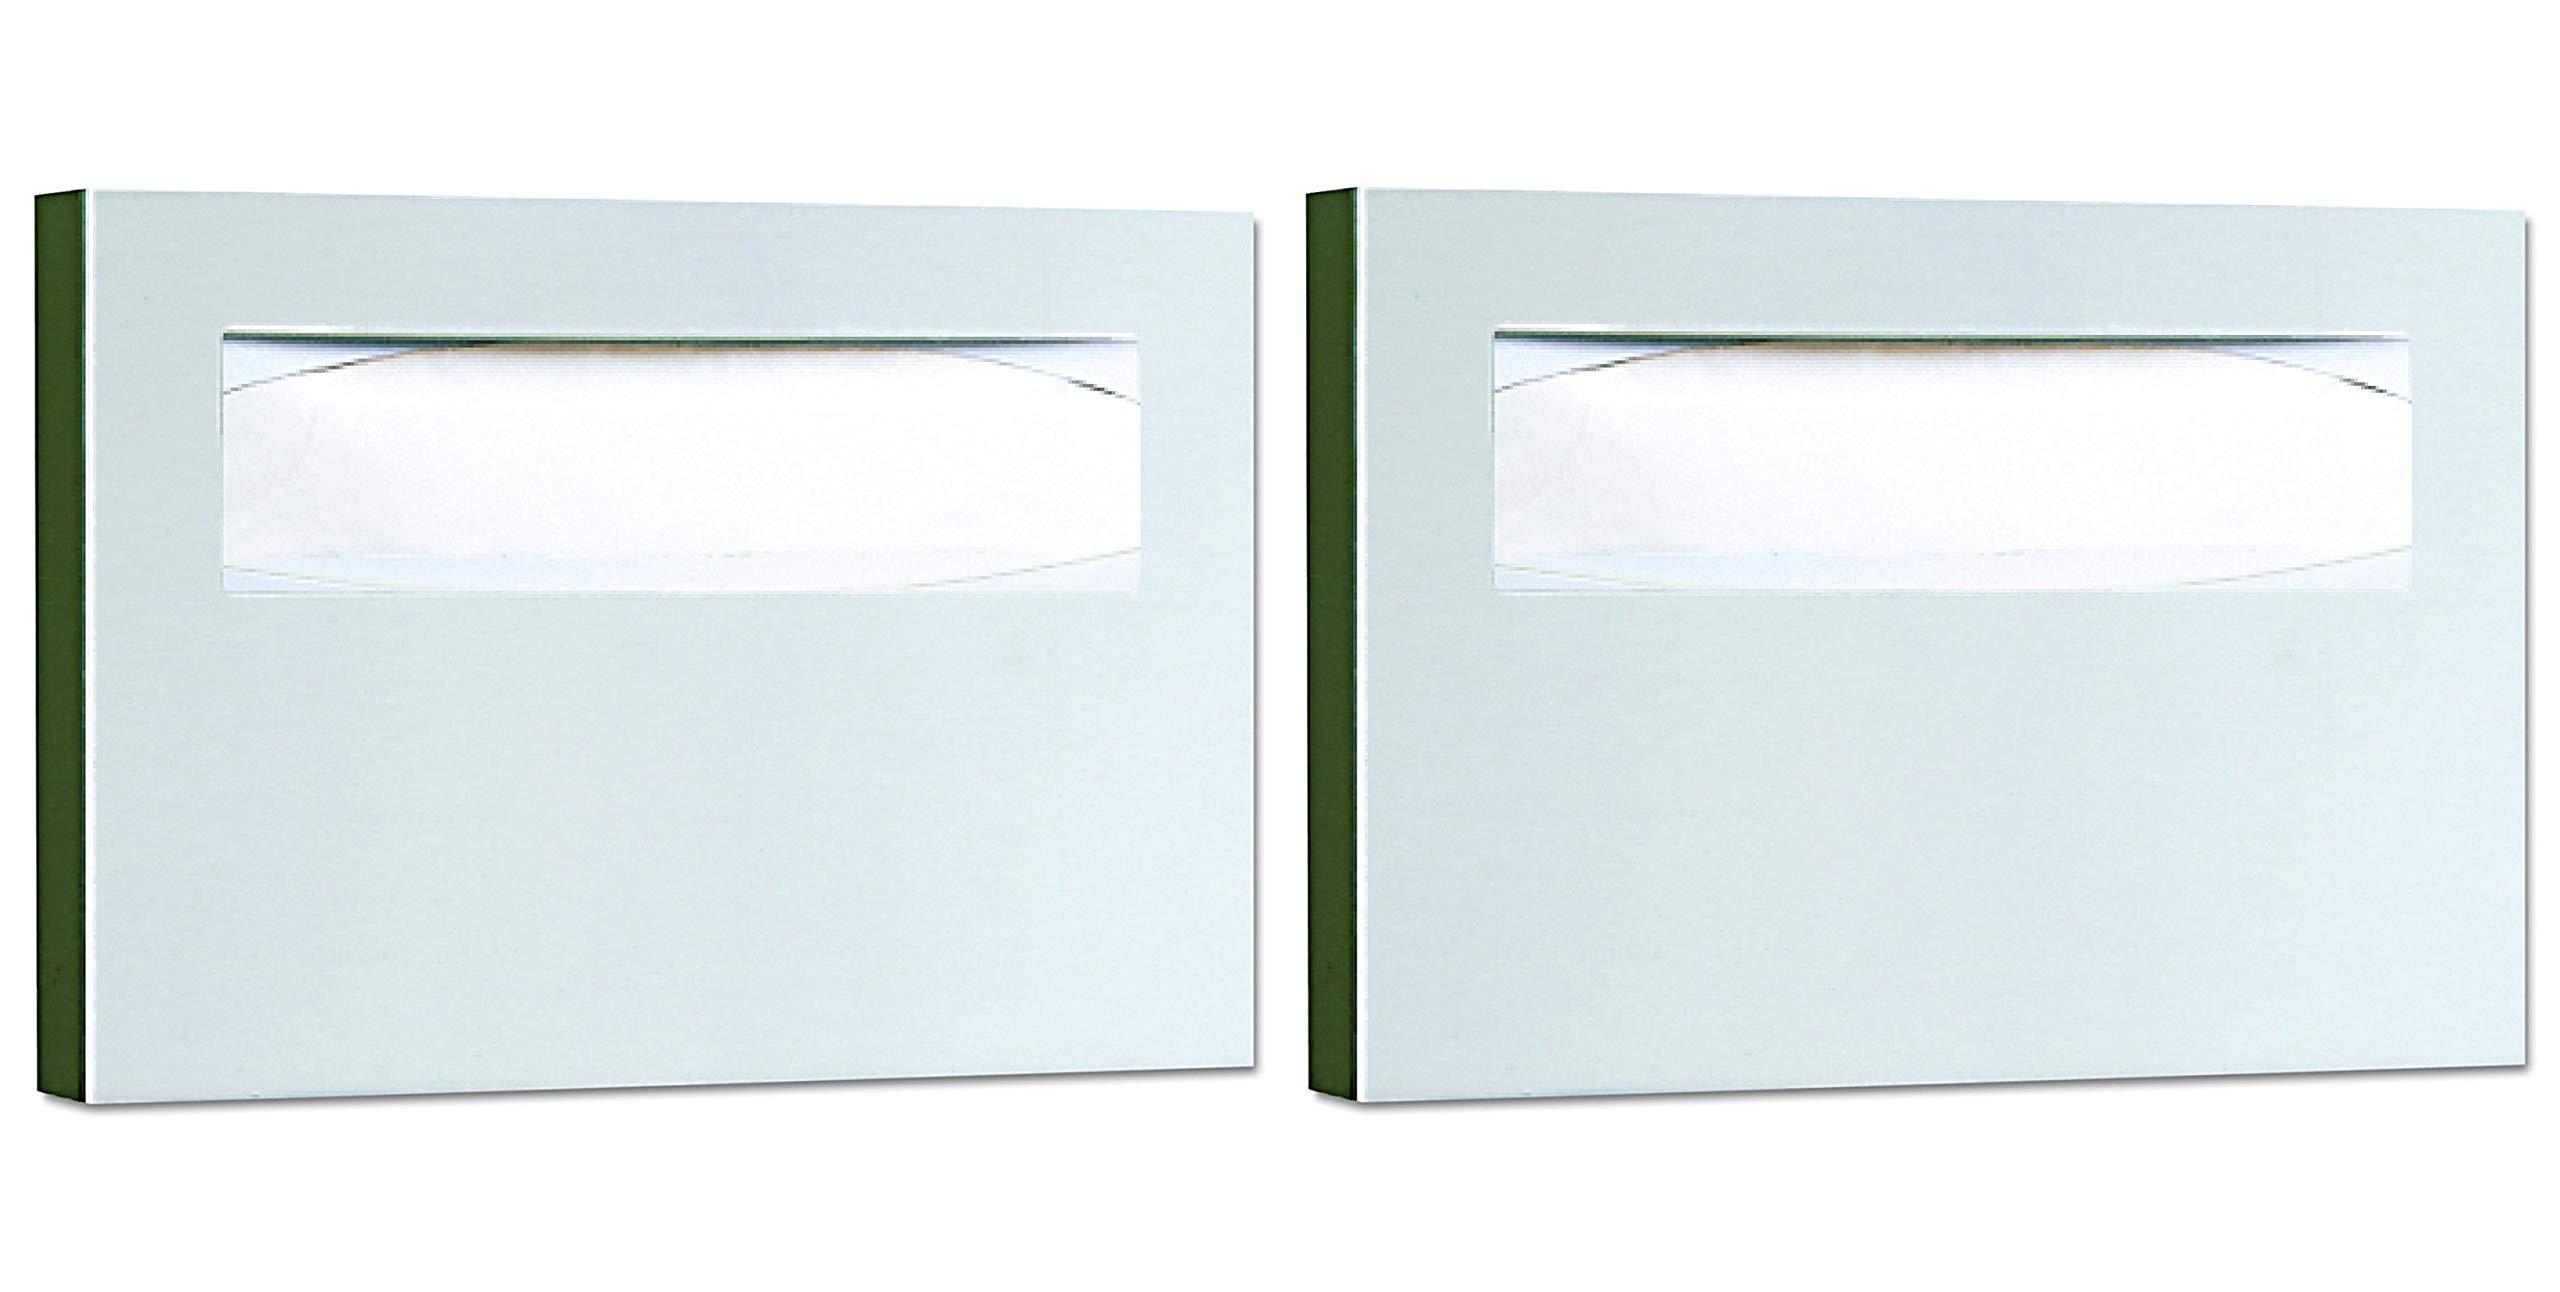 Bobrick 221 Stainless Steel Toilet Seat Cover Dispenser, 15 3/4 x 2 x 11, Satin Finish (Pack of 2)